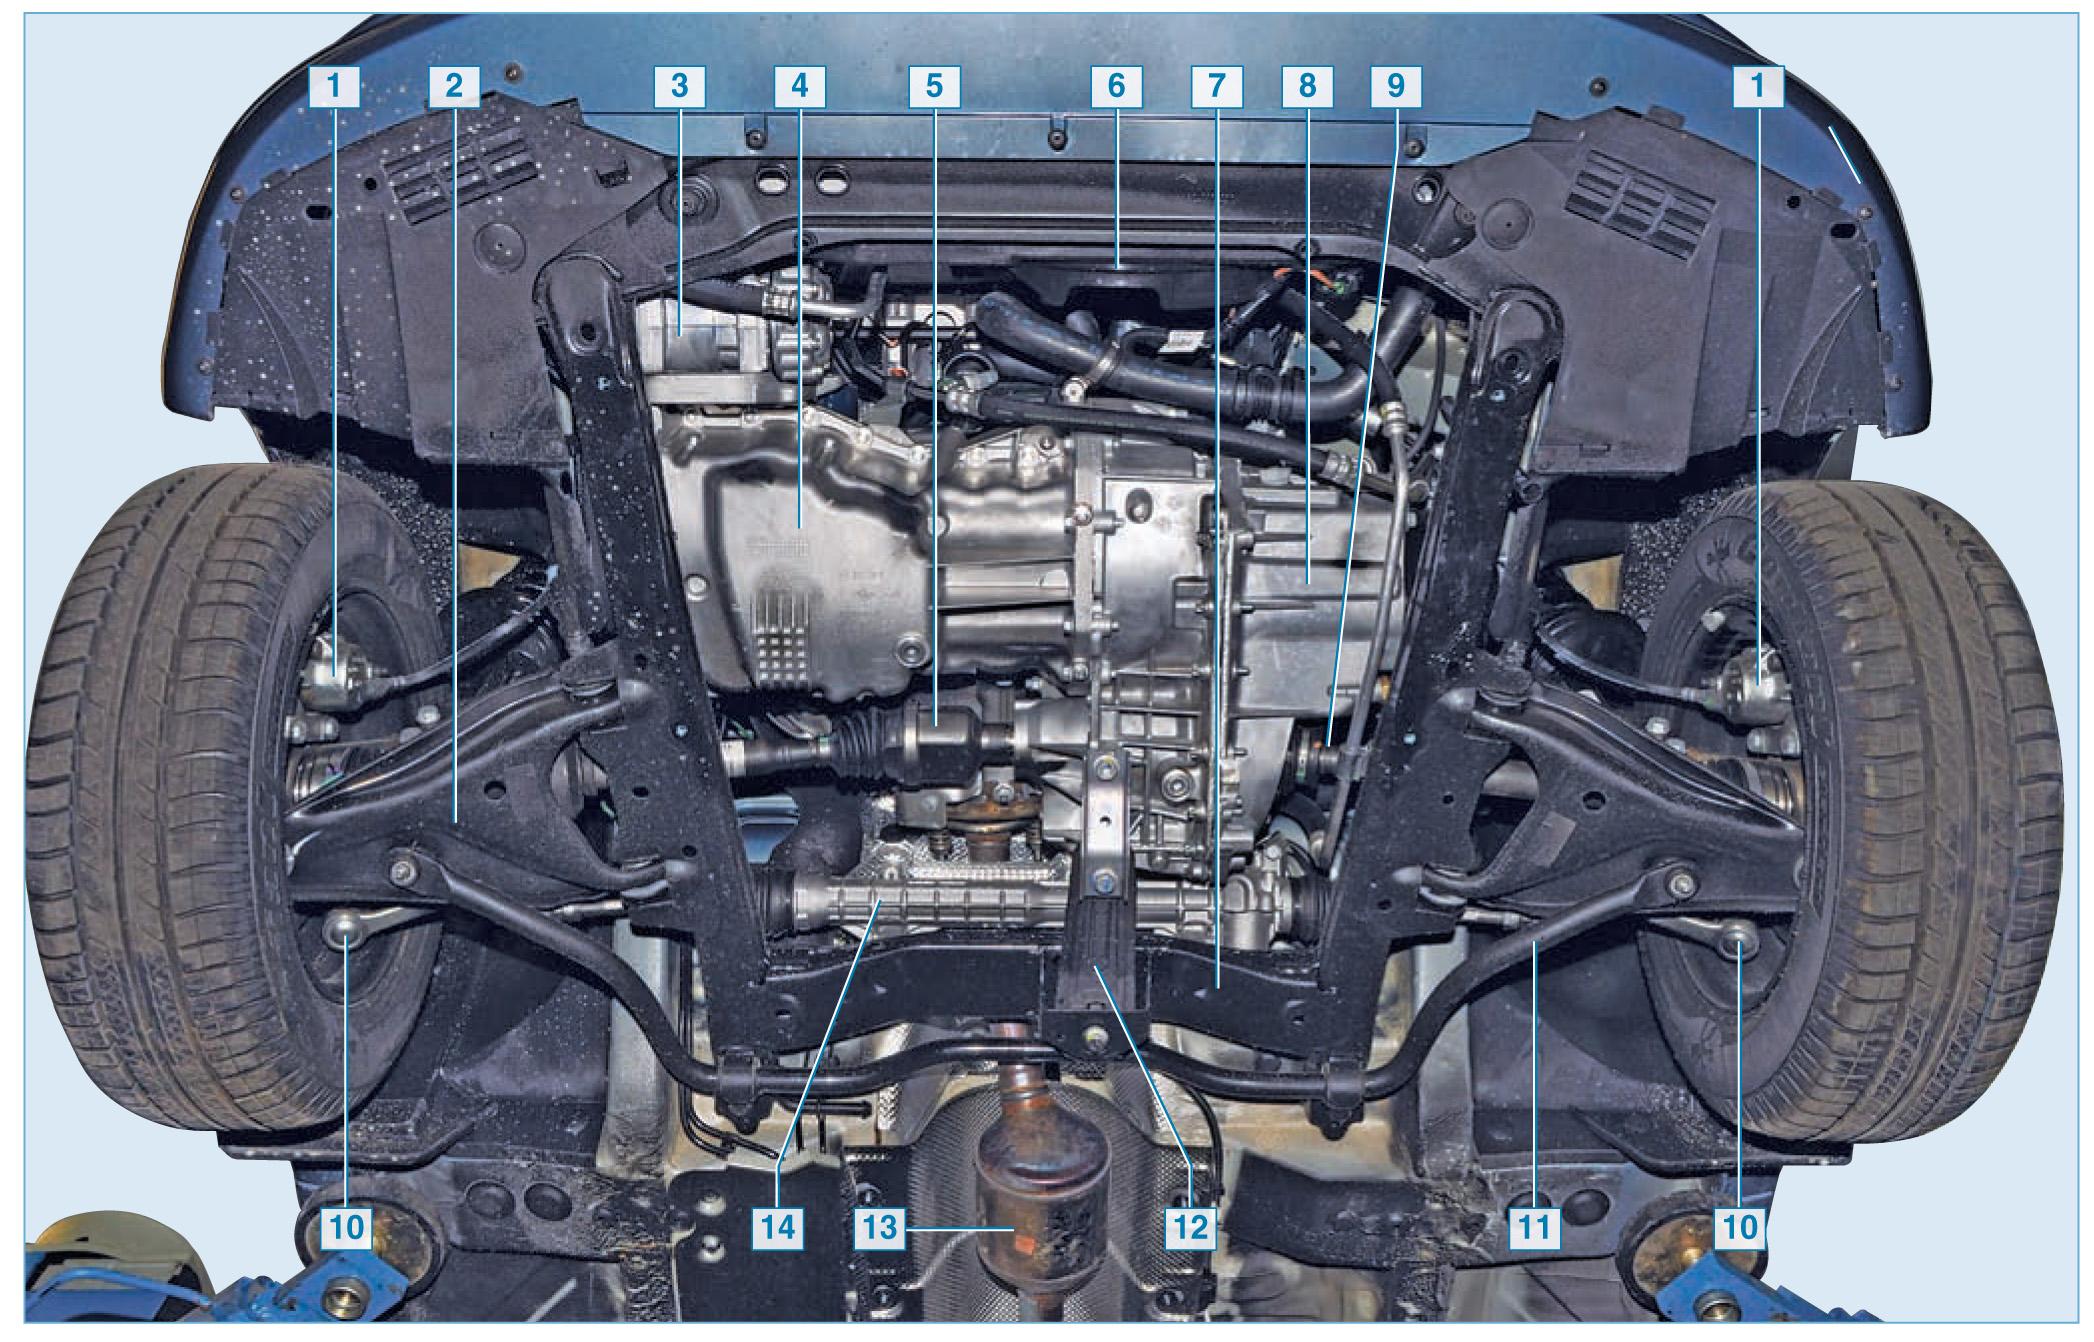 Двигатель Рено Логан 1.4: ресурс, мощность, неисправности